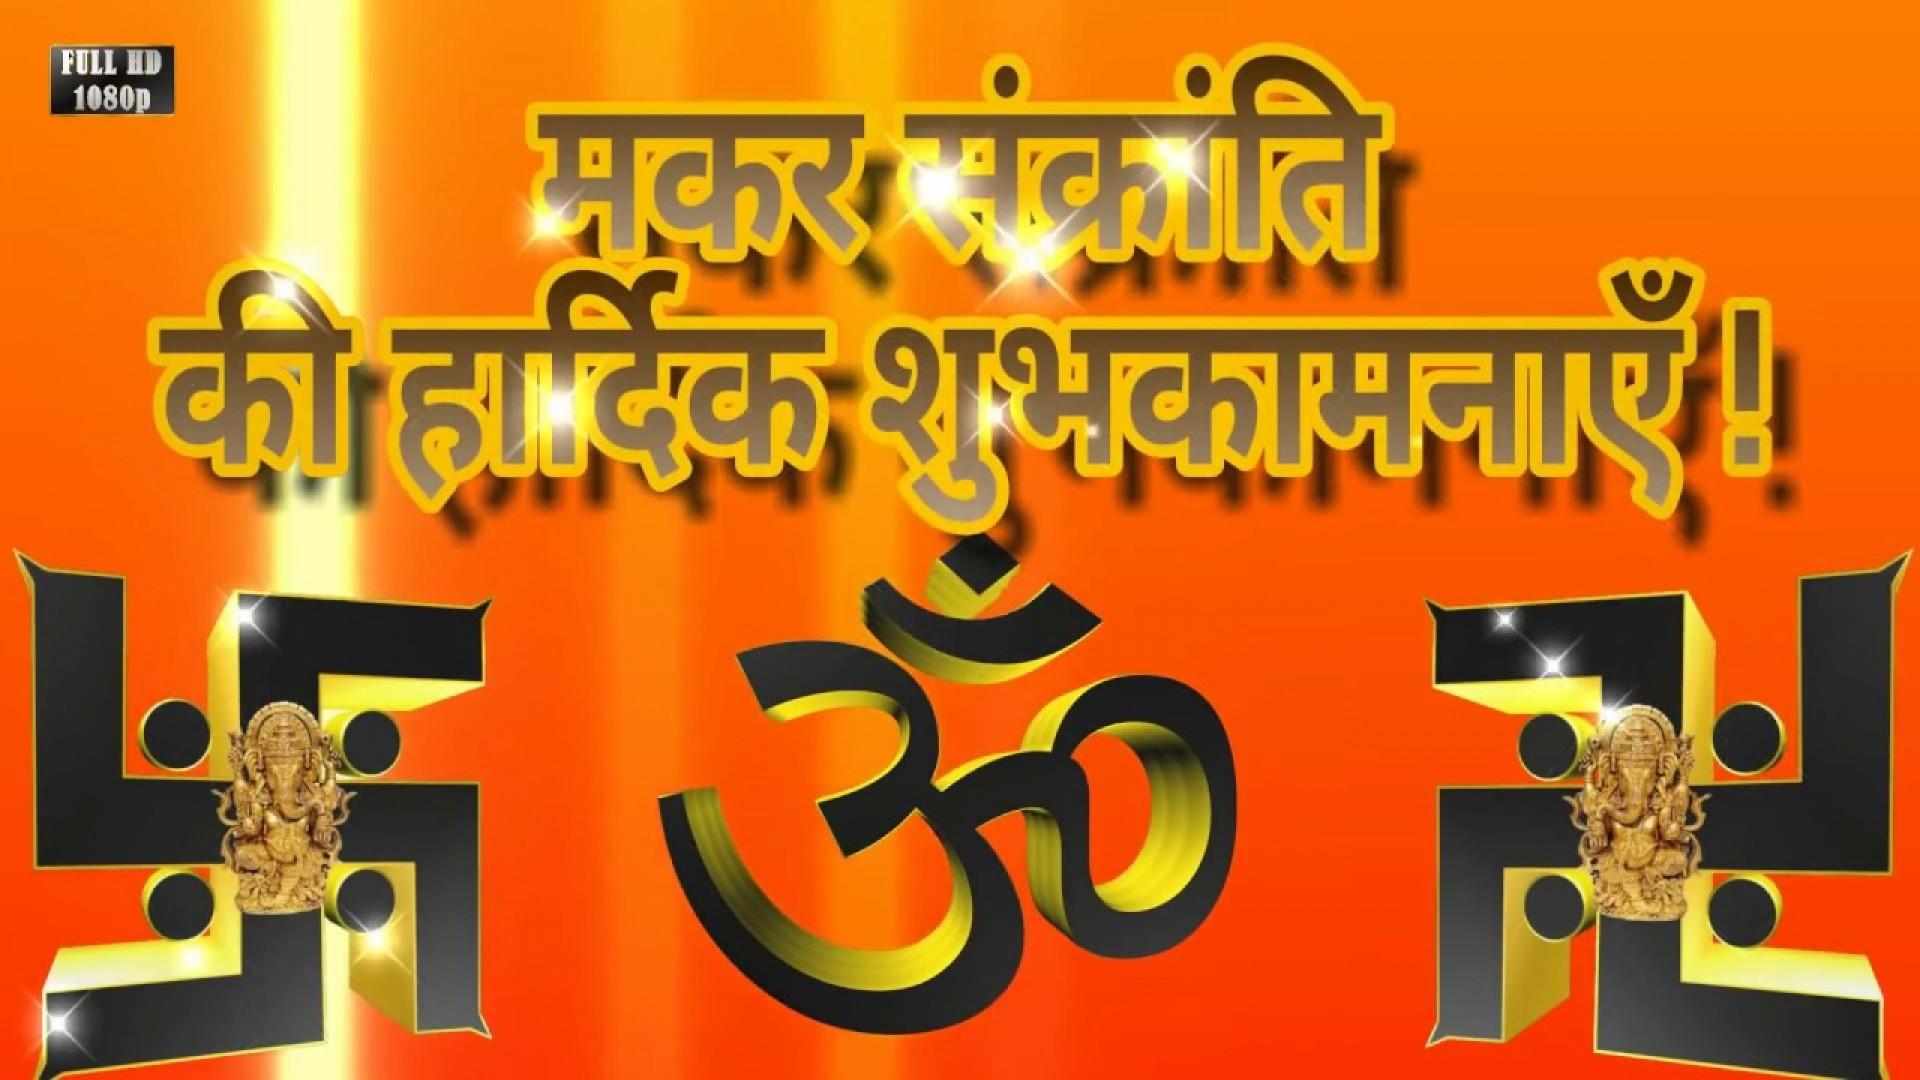 015 Maxresdefault Essay Example Makar Sankranti In Surprising Hindi Pdf Download 2018 1920